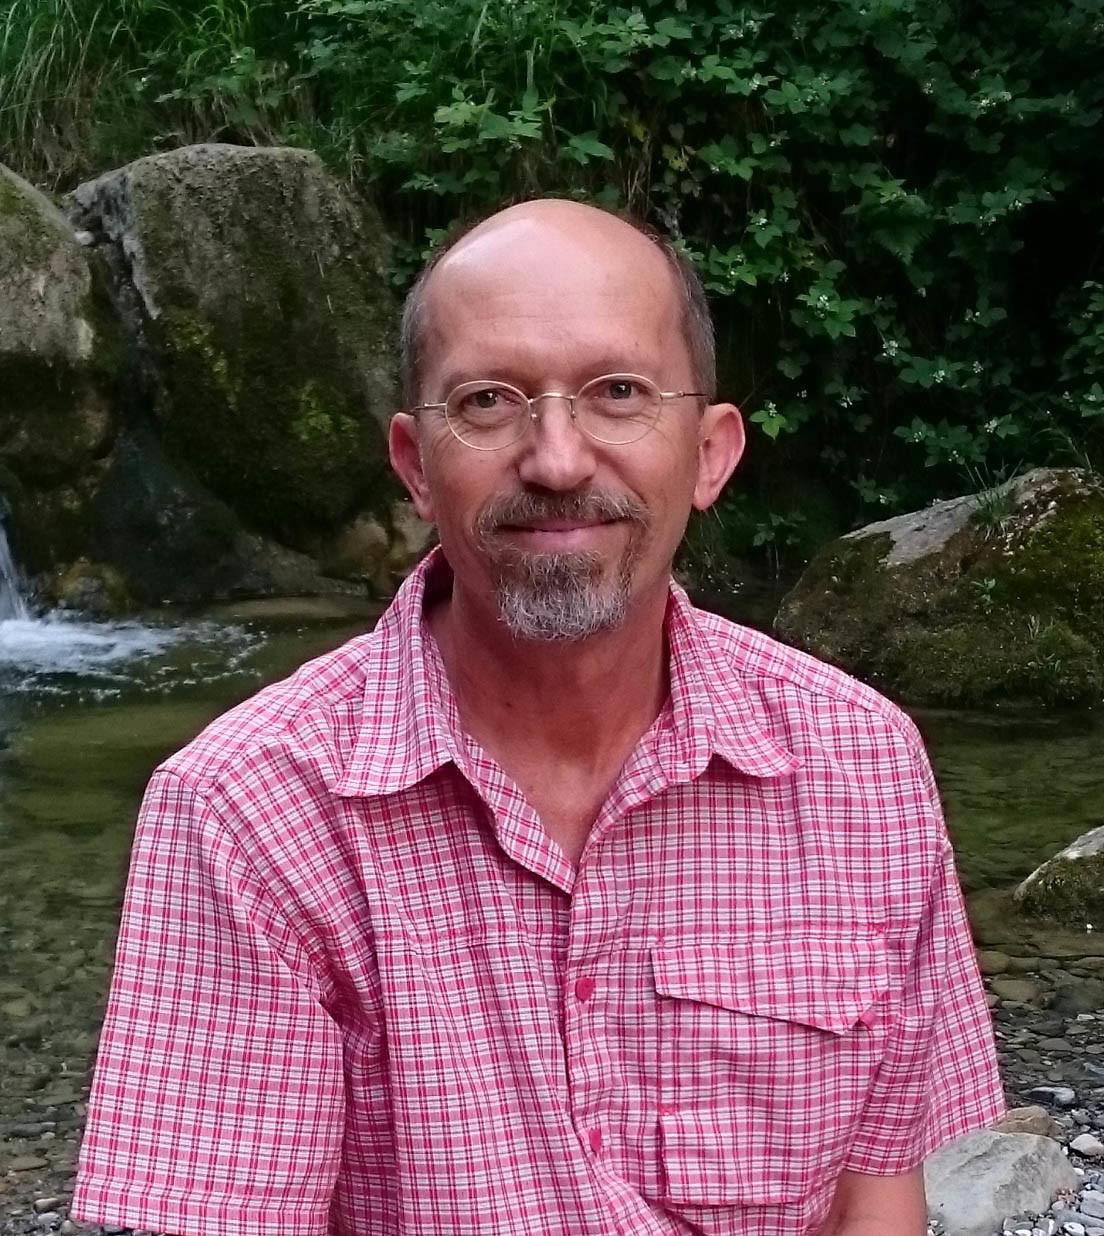 Peter Baumann, Natural Doctor & Quild Inventor